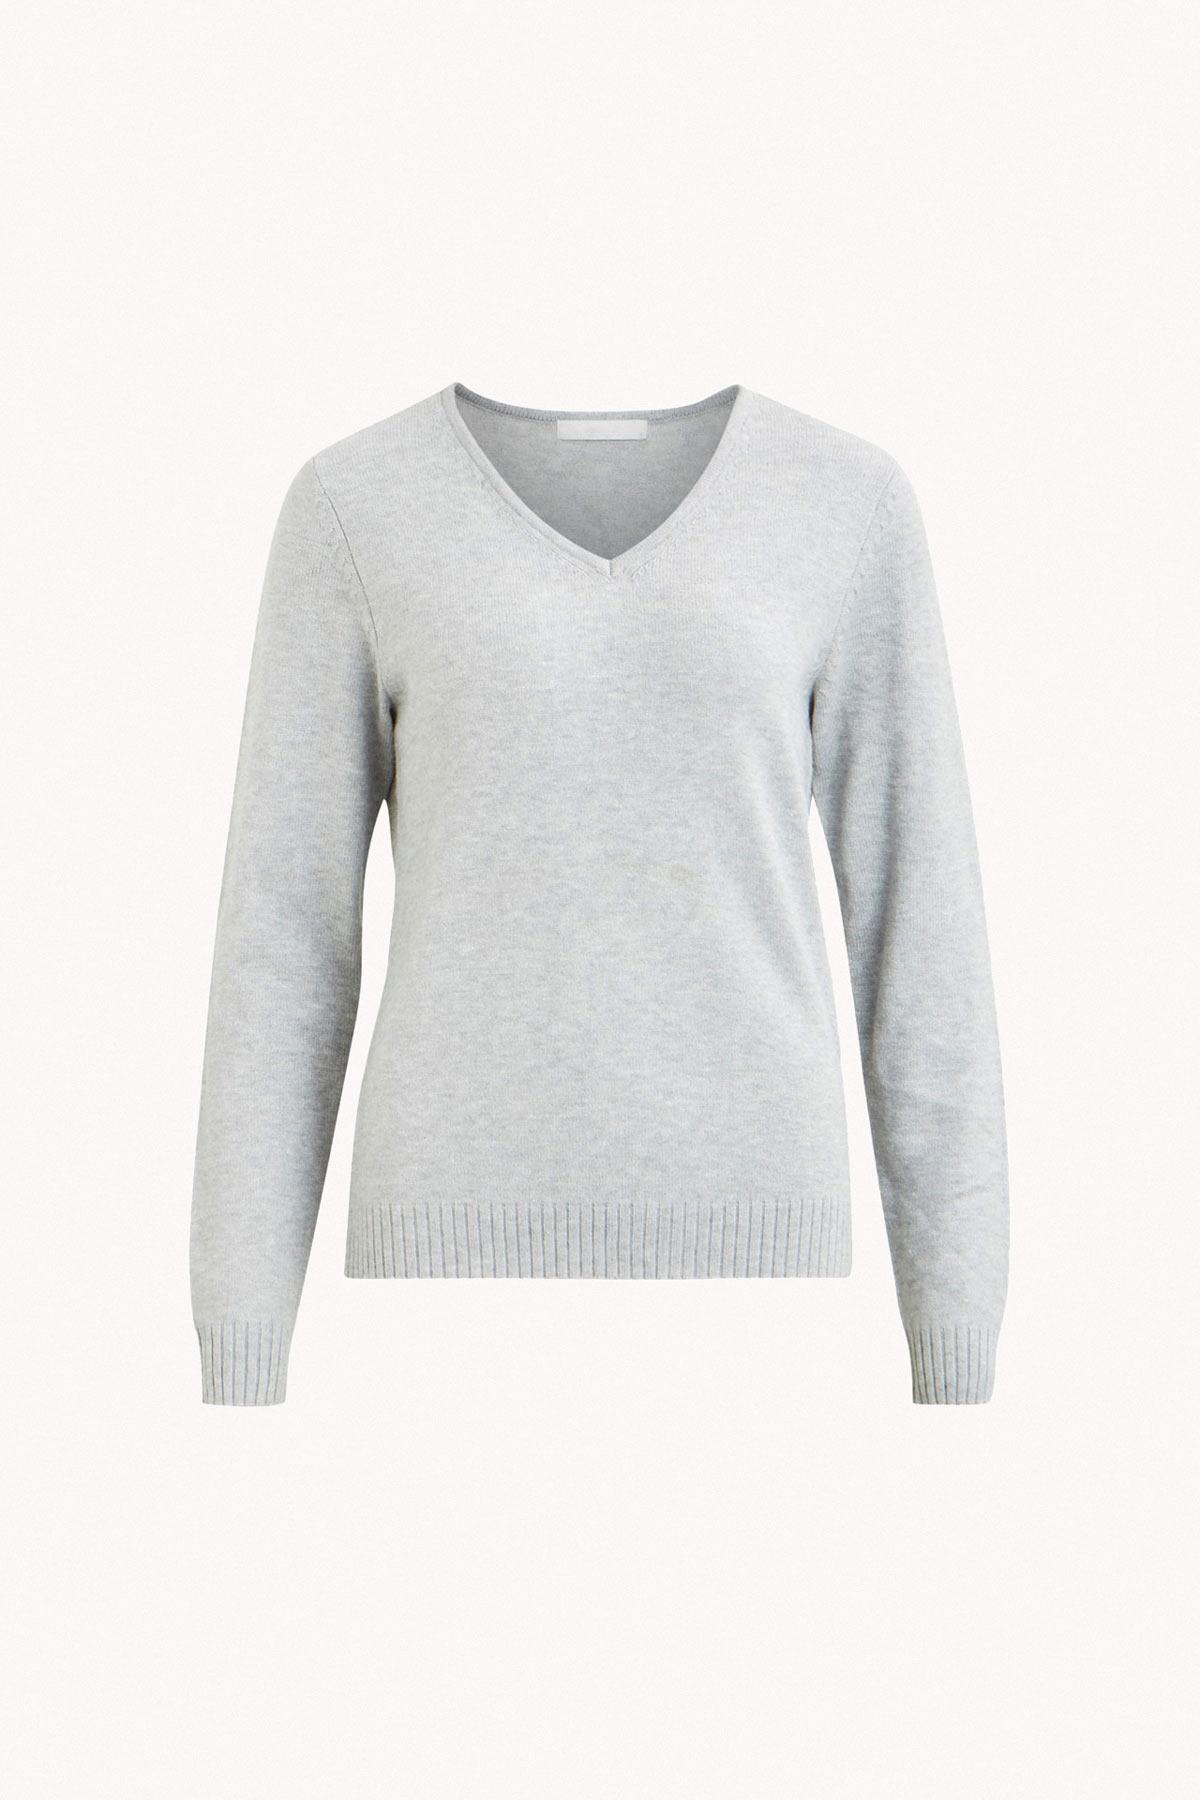 jersey gris armario cápsula